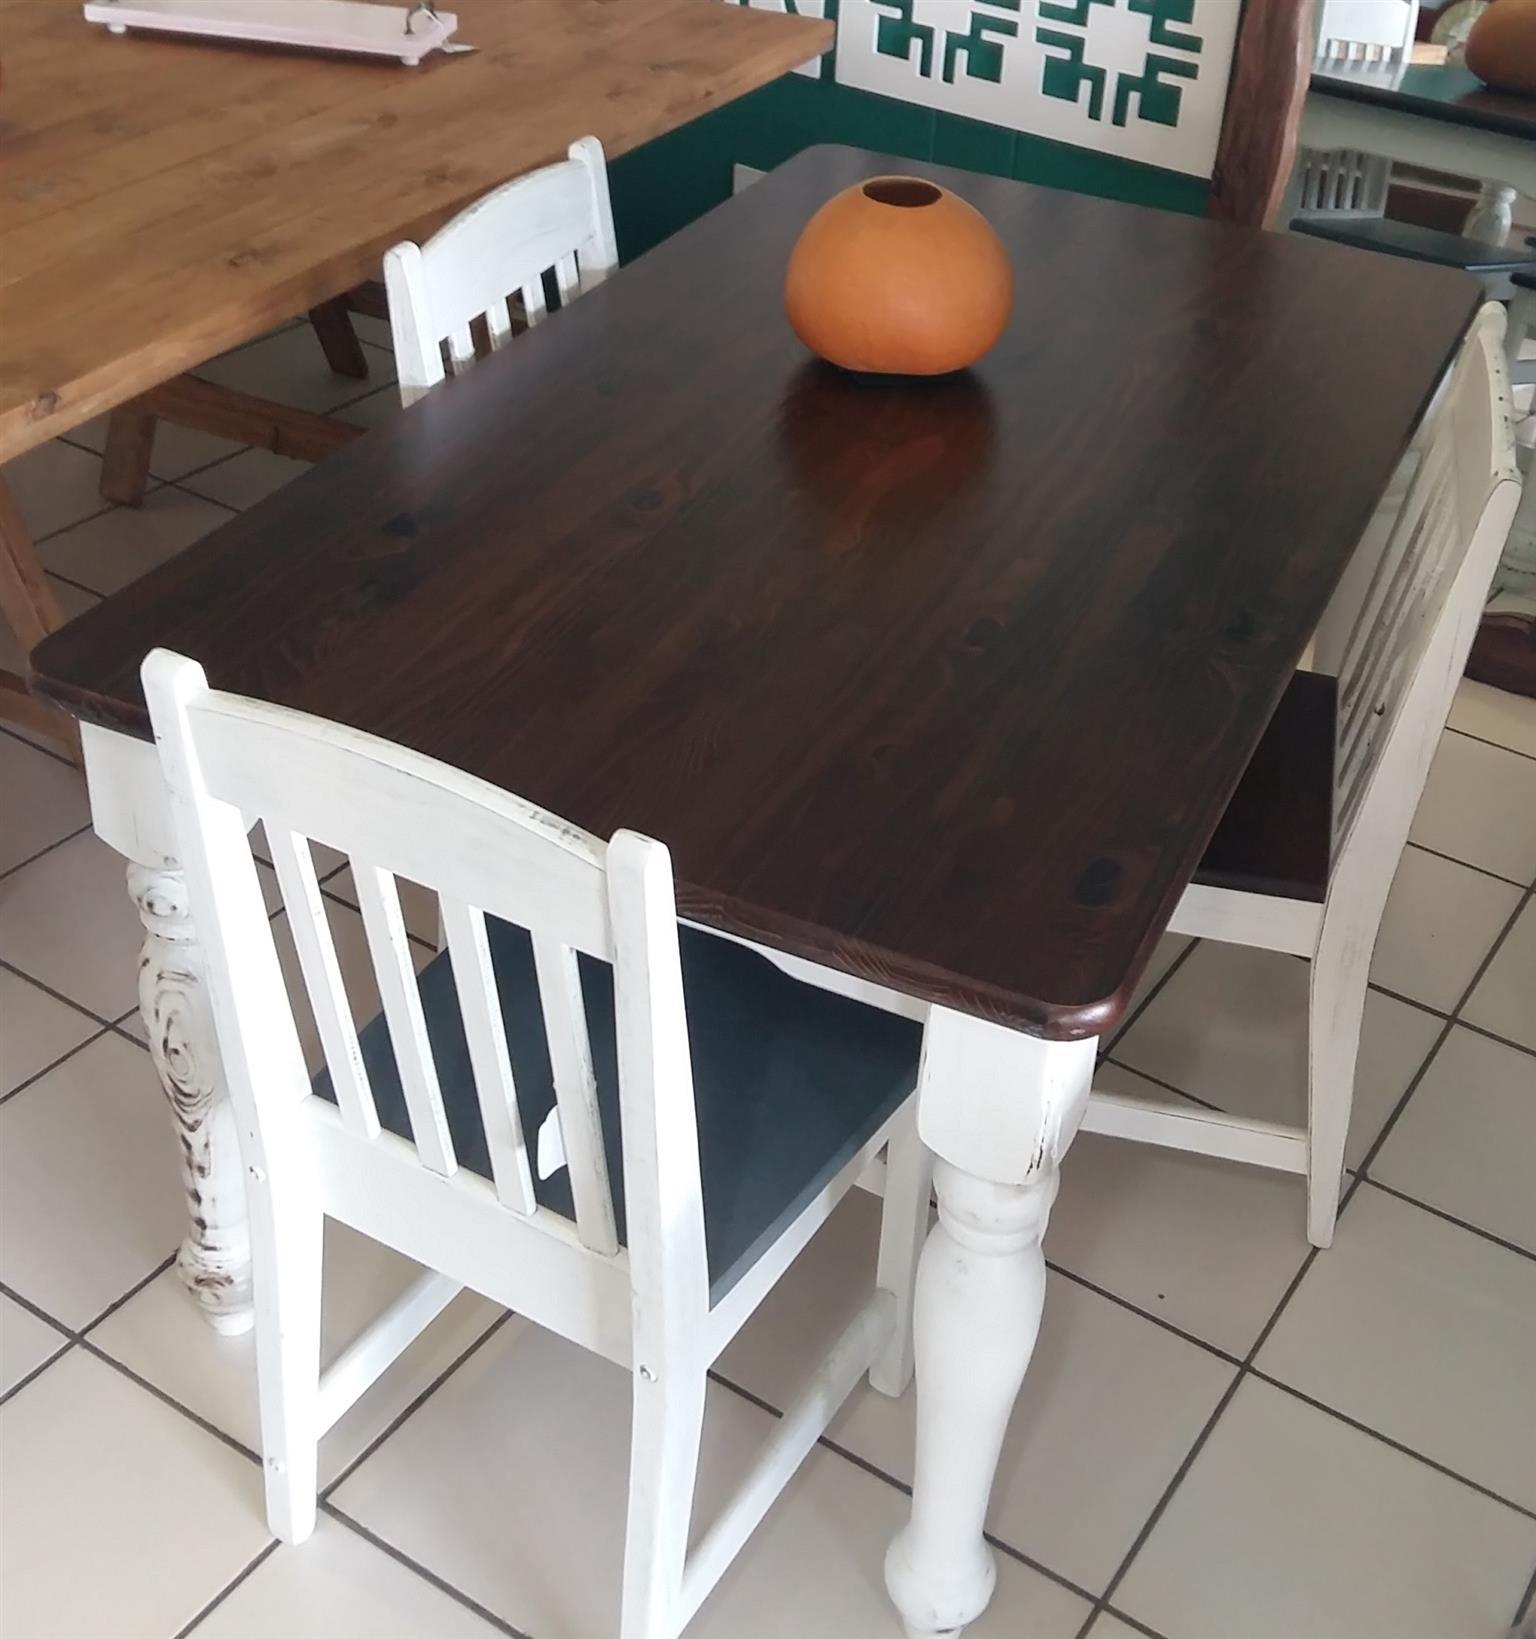 1500 x 900 Dining Table - Van Ouds